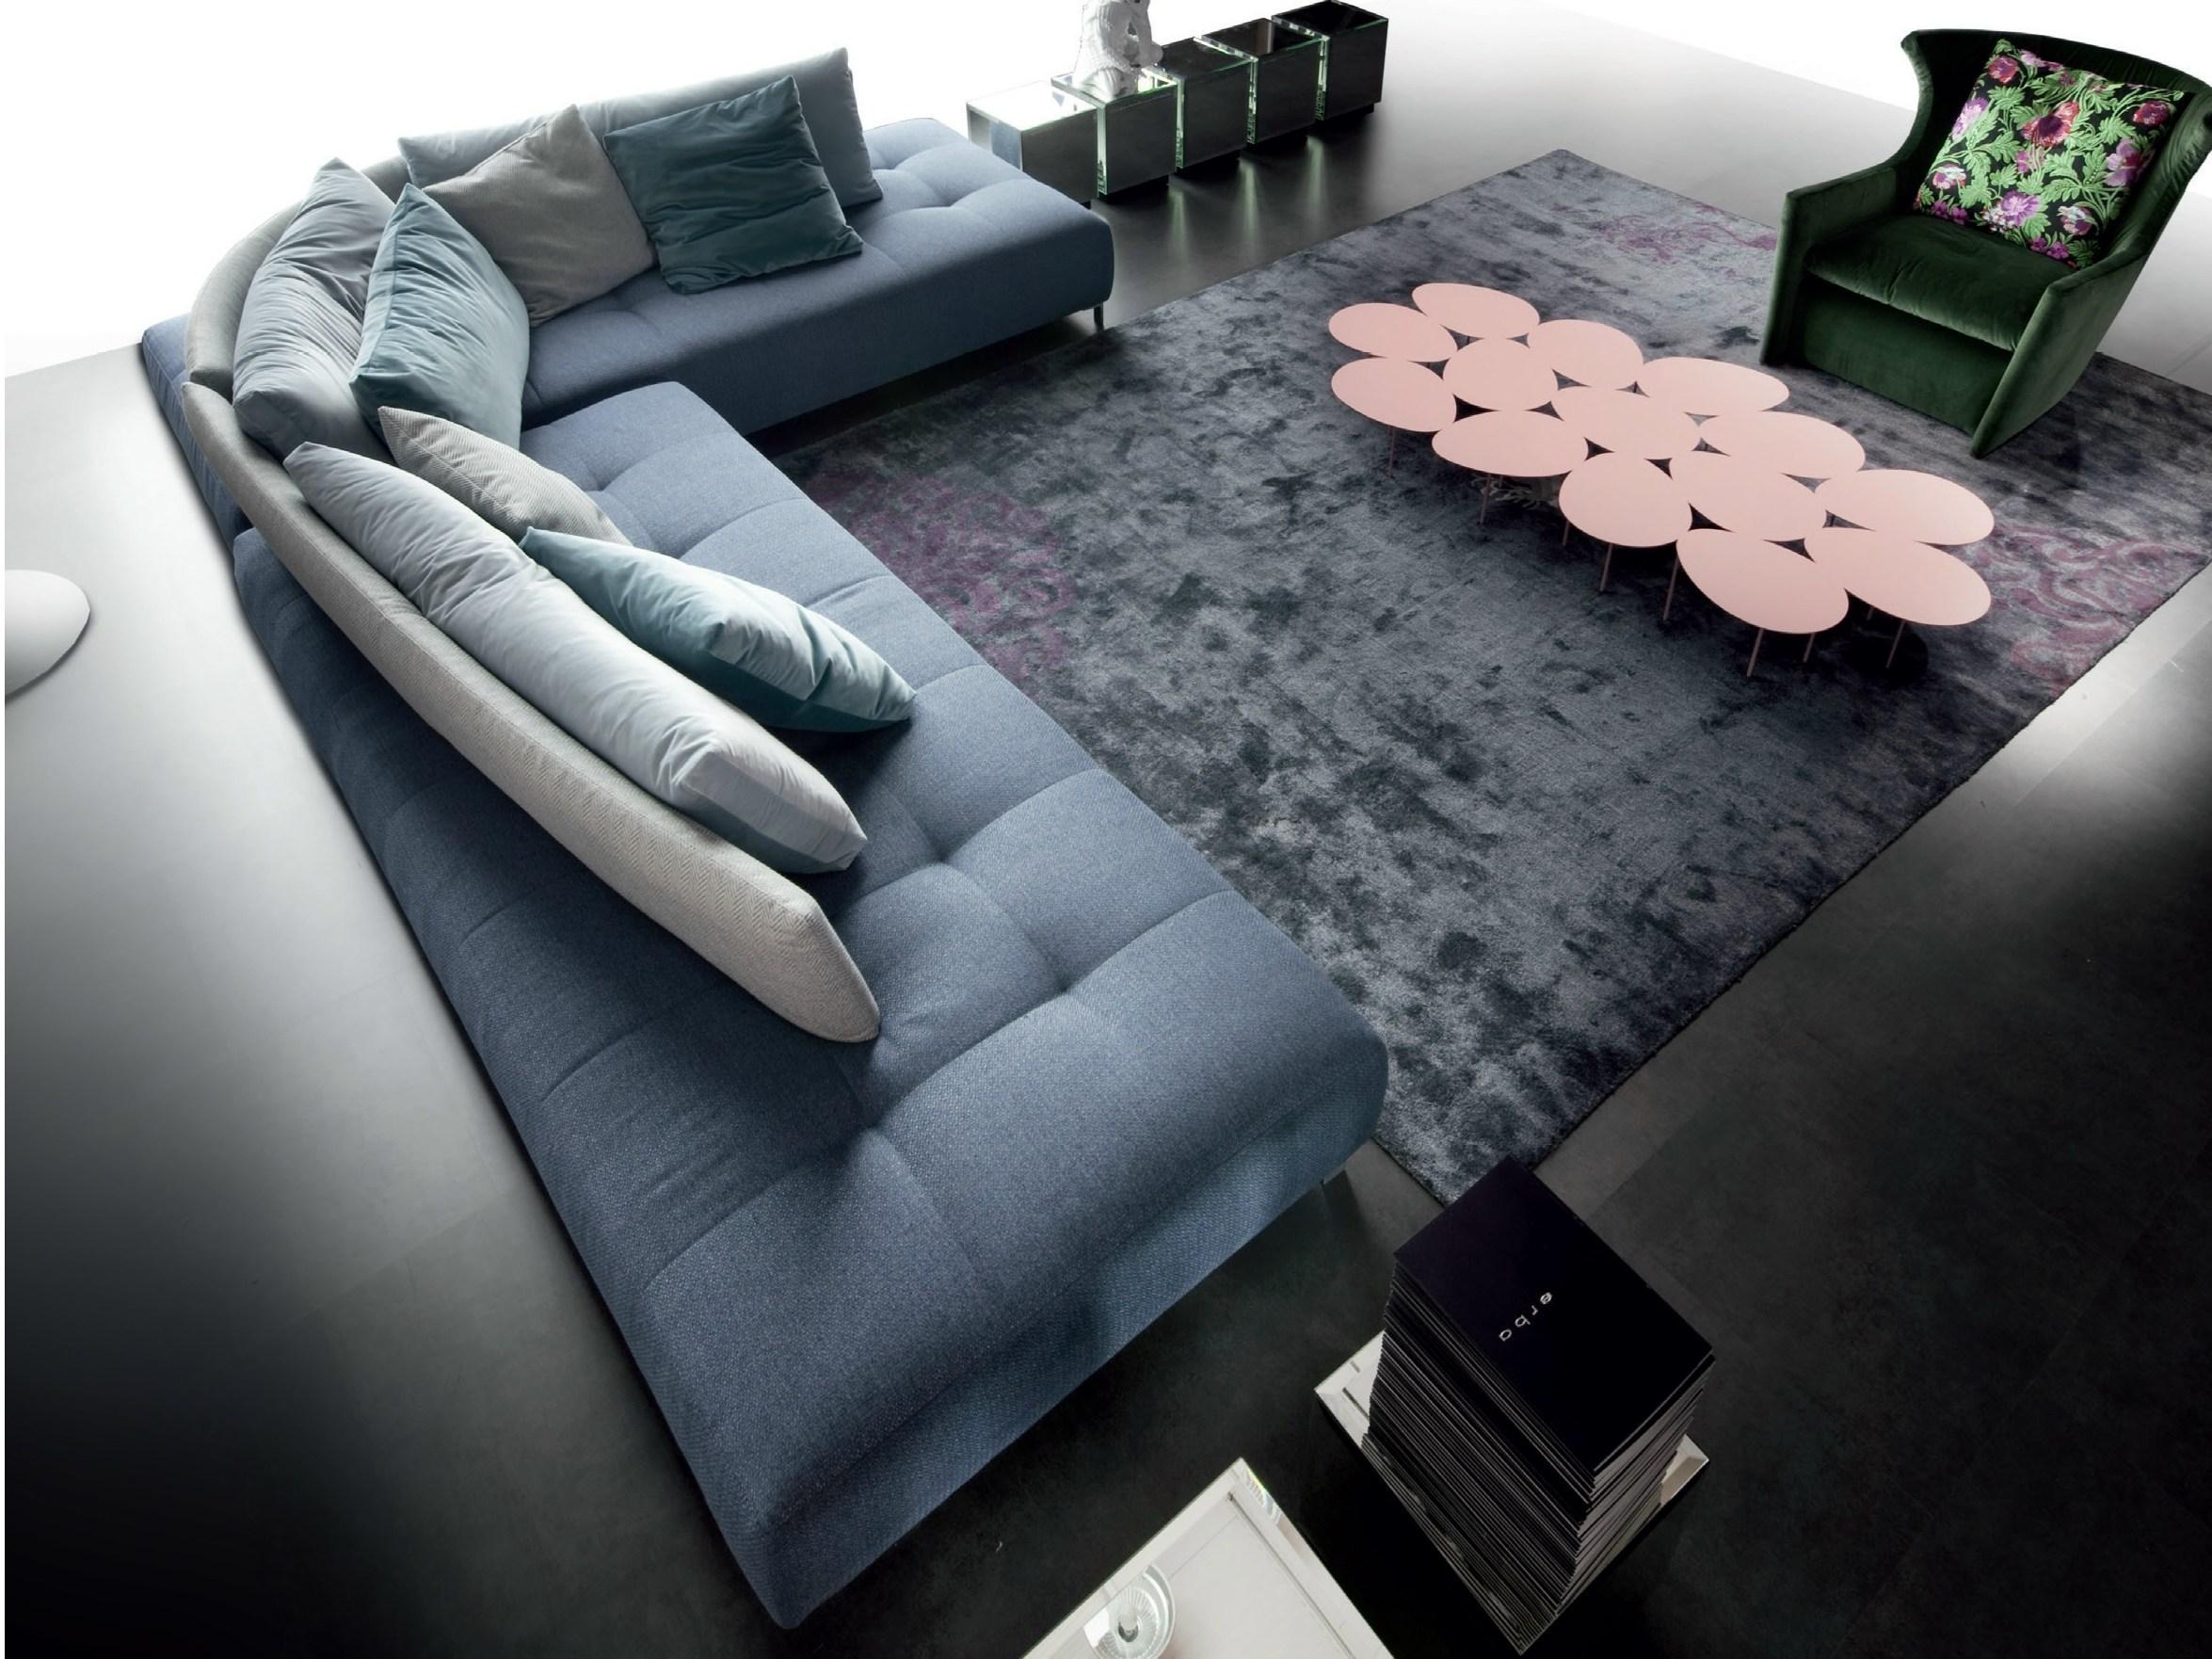 Sectional Sofa Conversationerba Italia Design Giorgio Soressi Throughout Conversation Sectional (View 5 of 15)